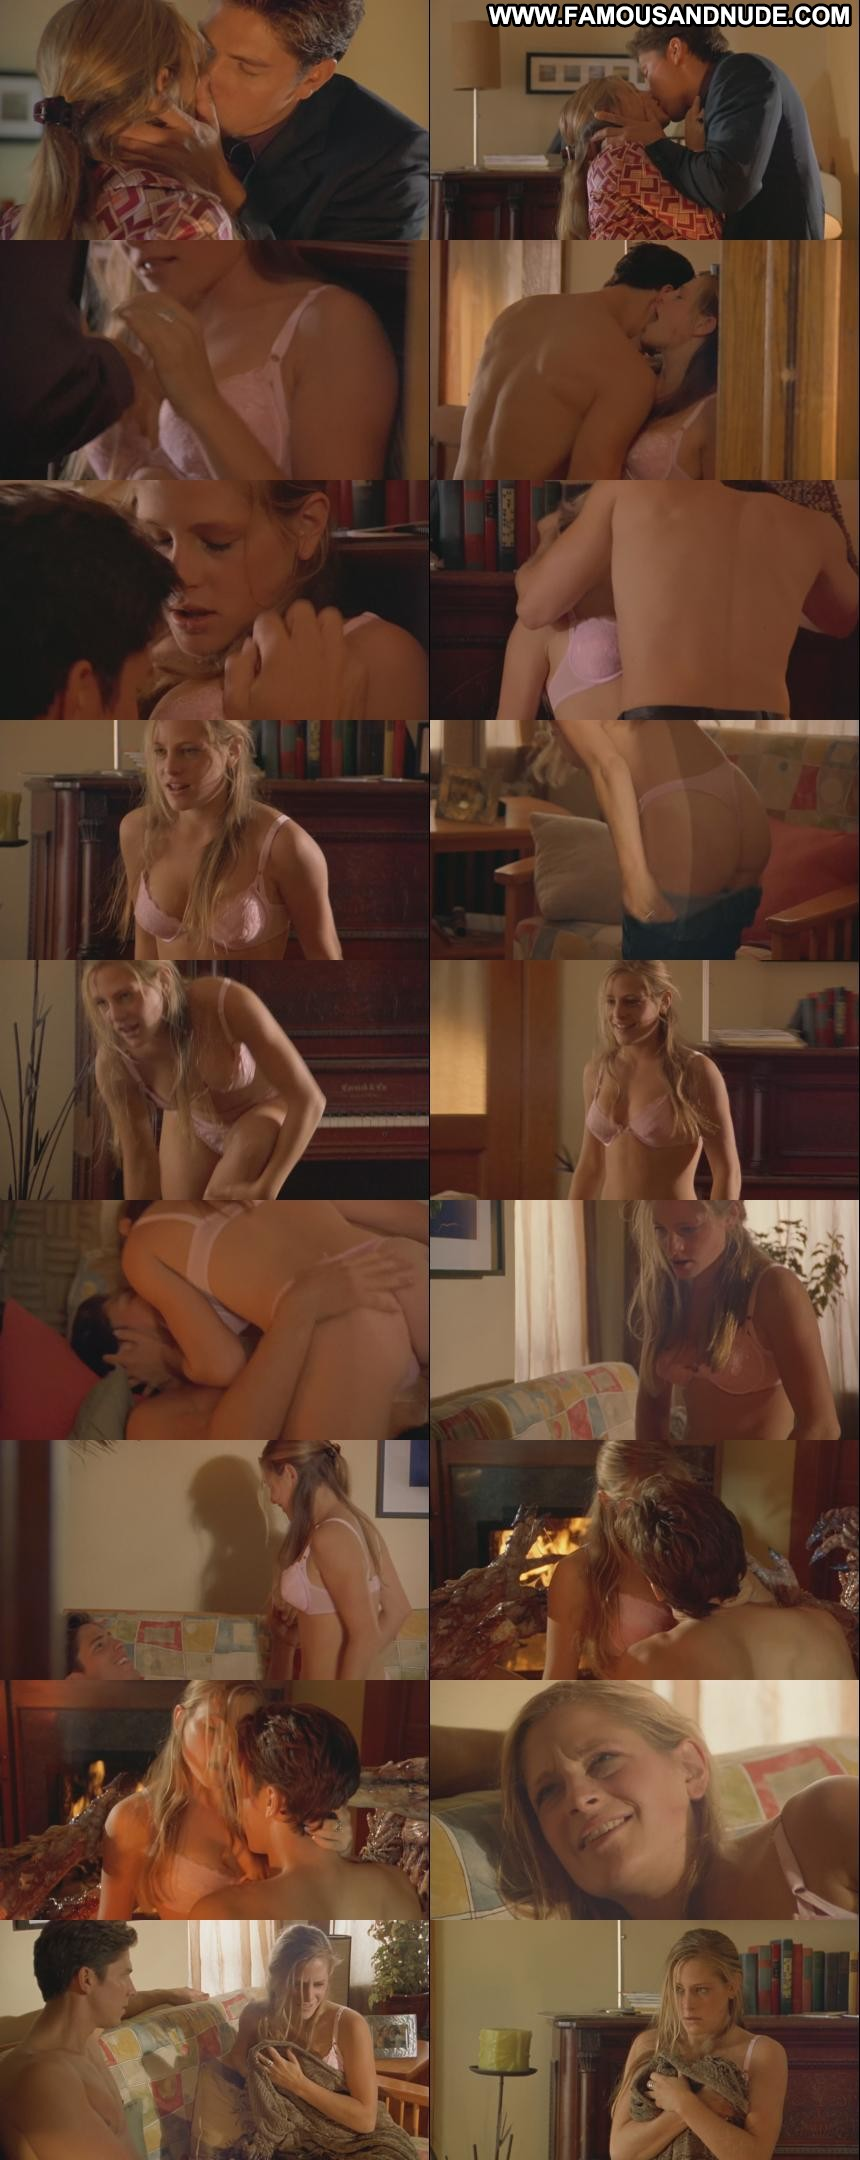 Tara spencer nairn sex, antarctica nudist camps